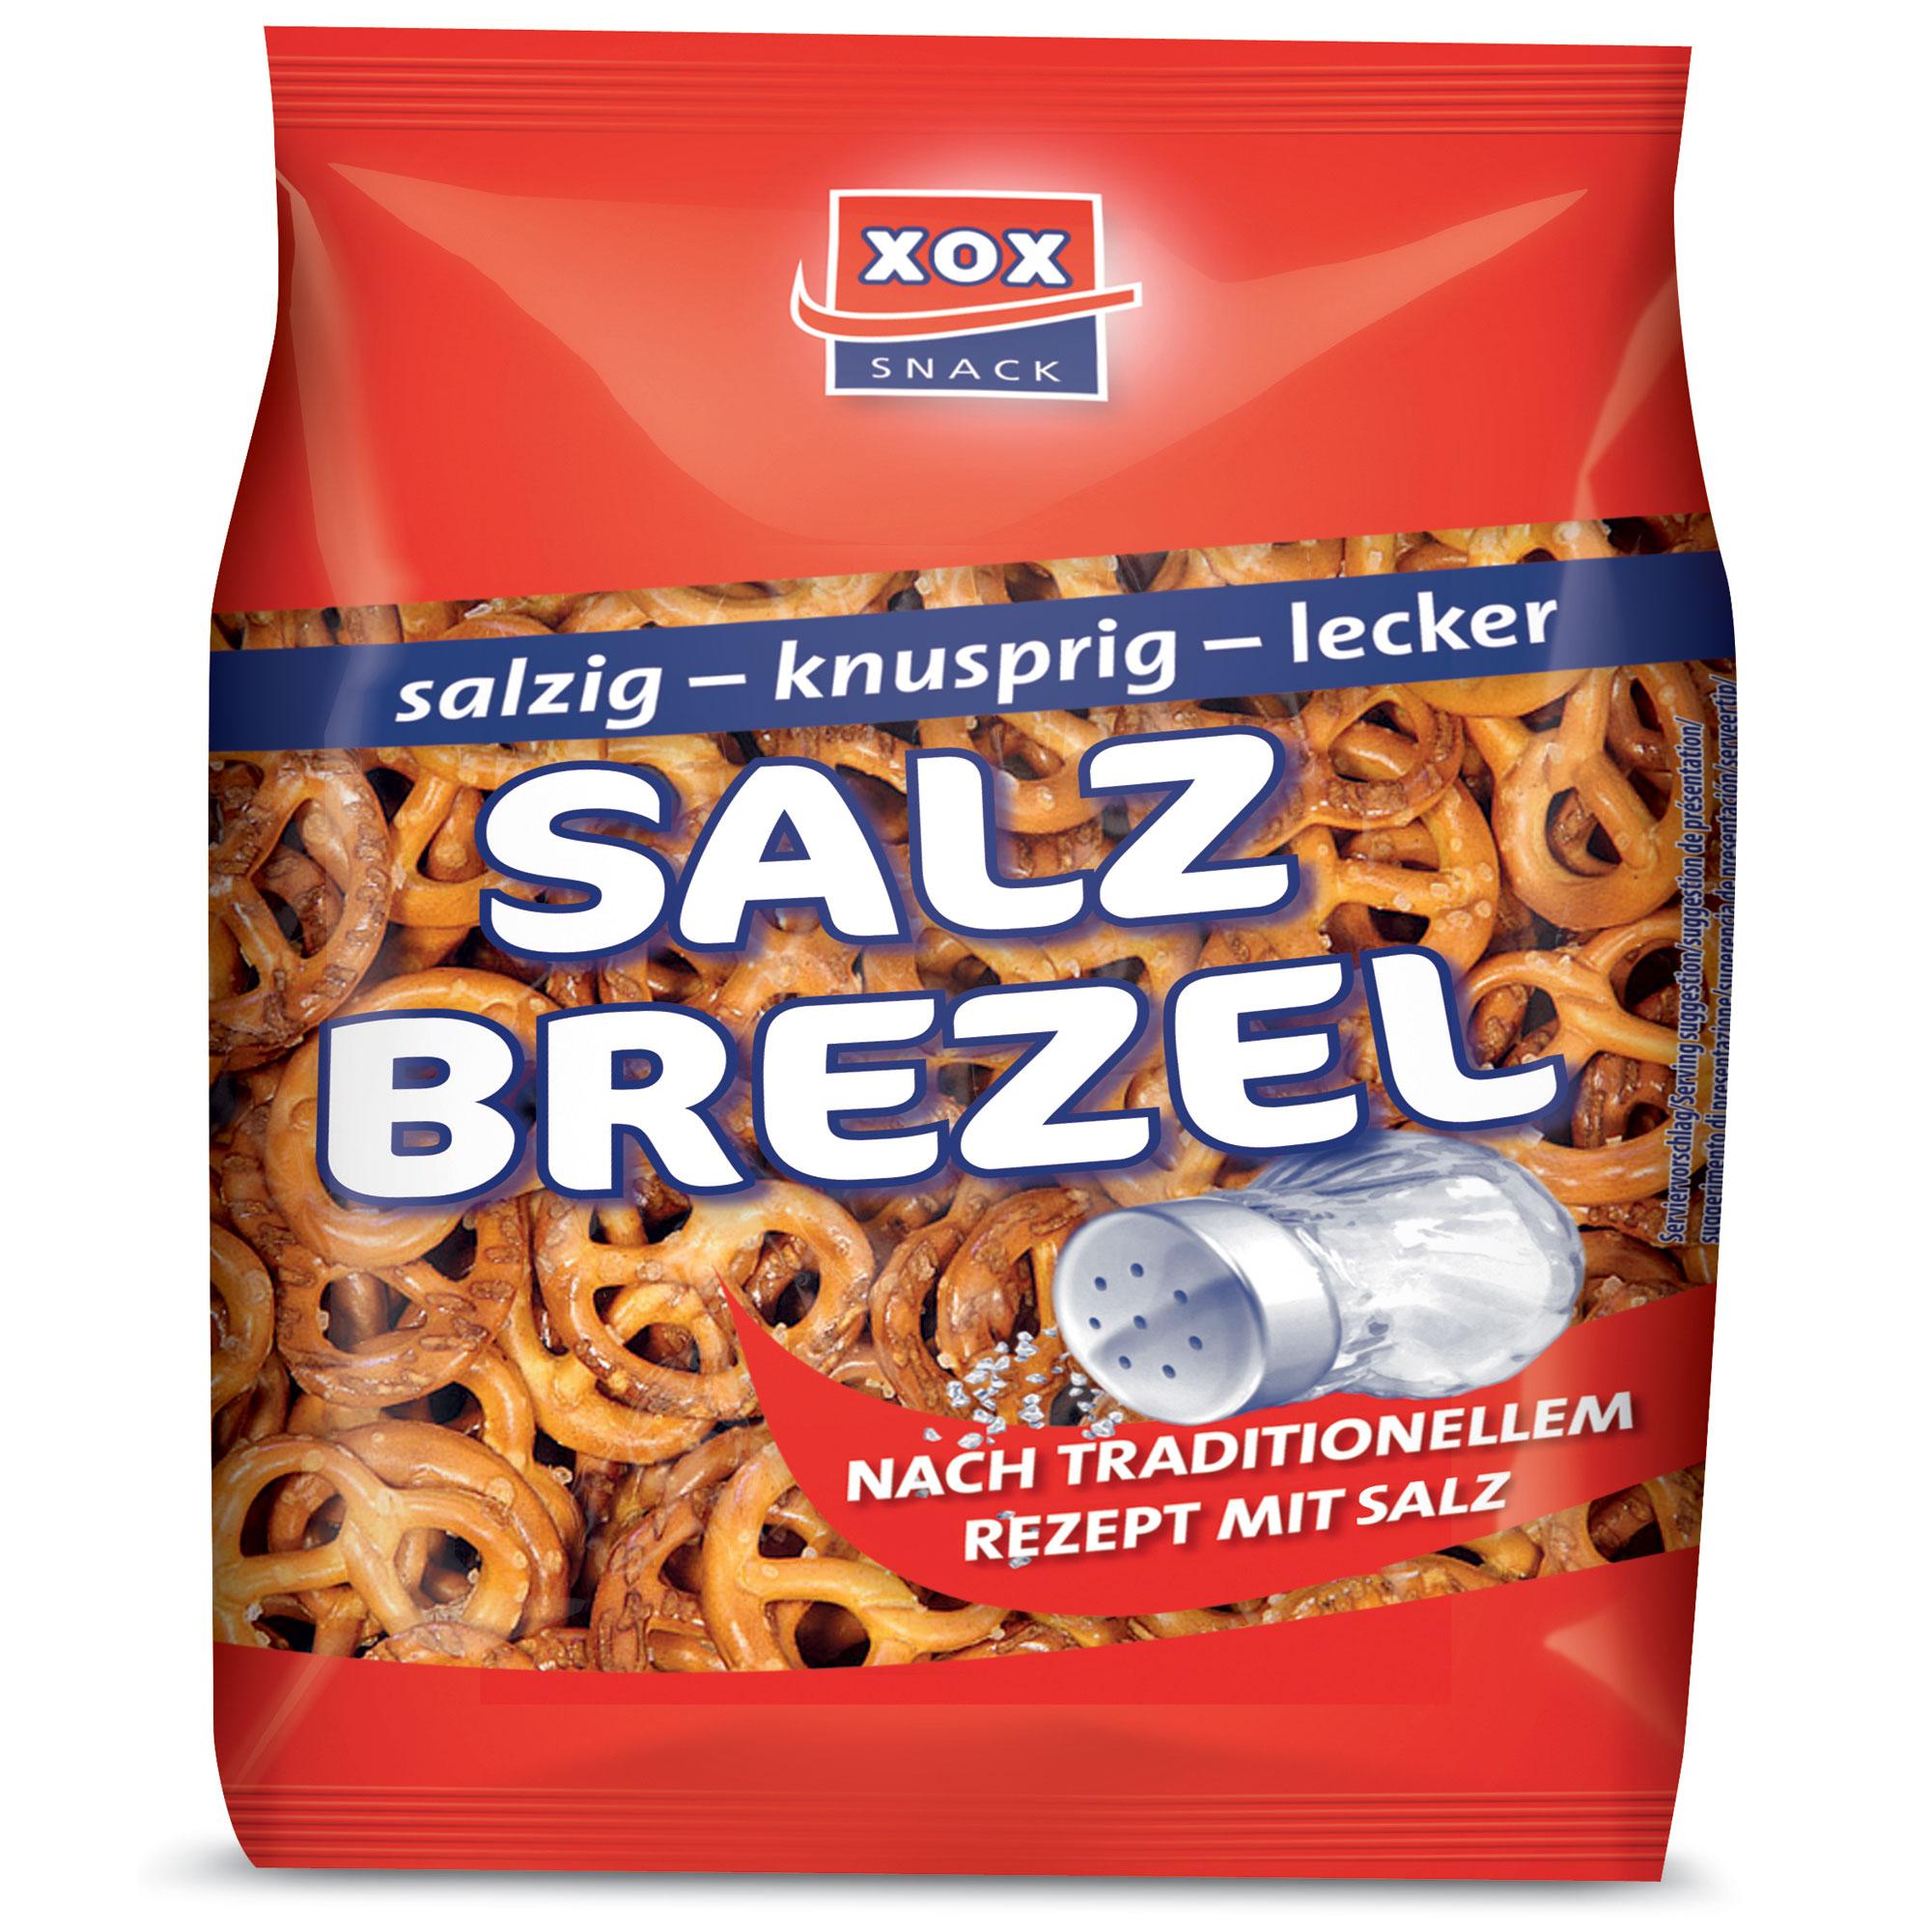 XOX Salz Brezel | Online kaufen im World of Sweets Shop